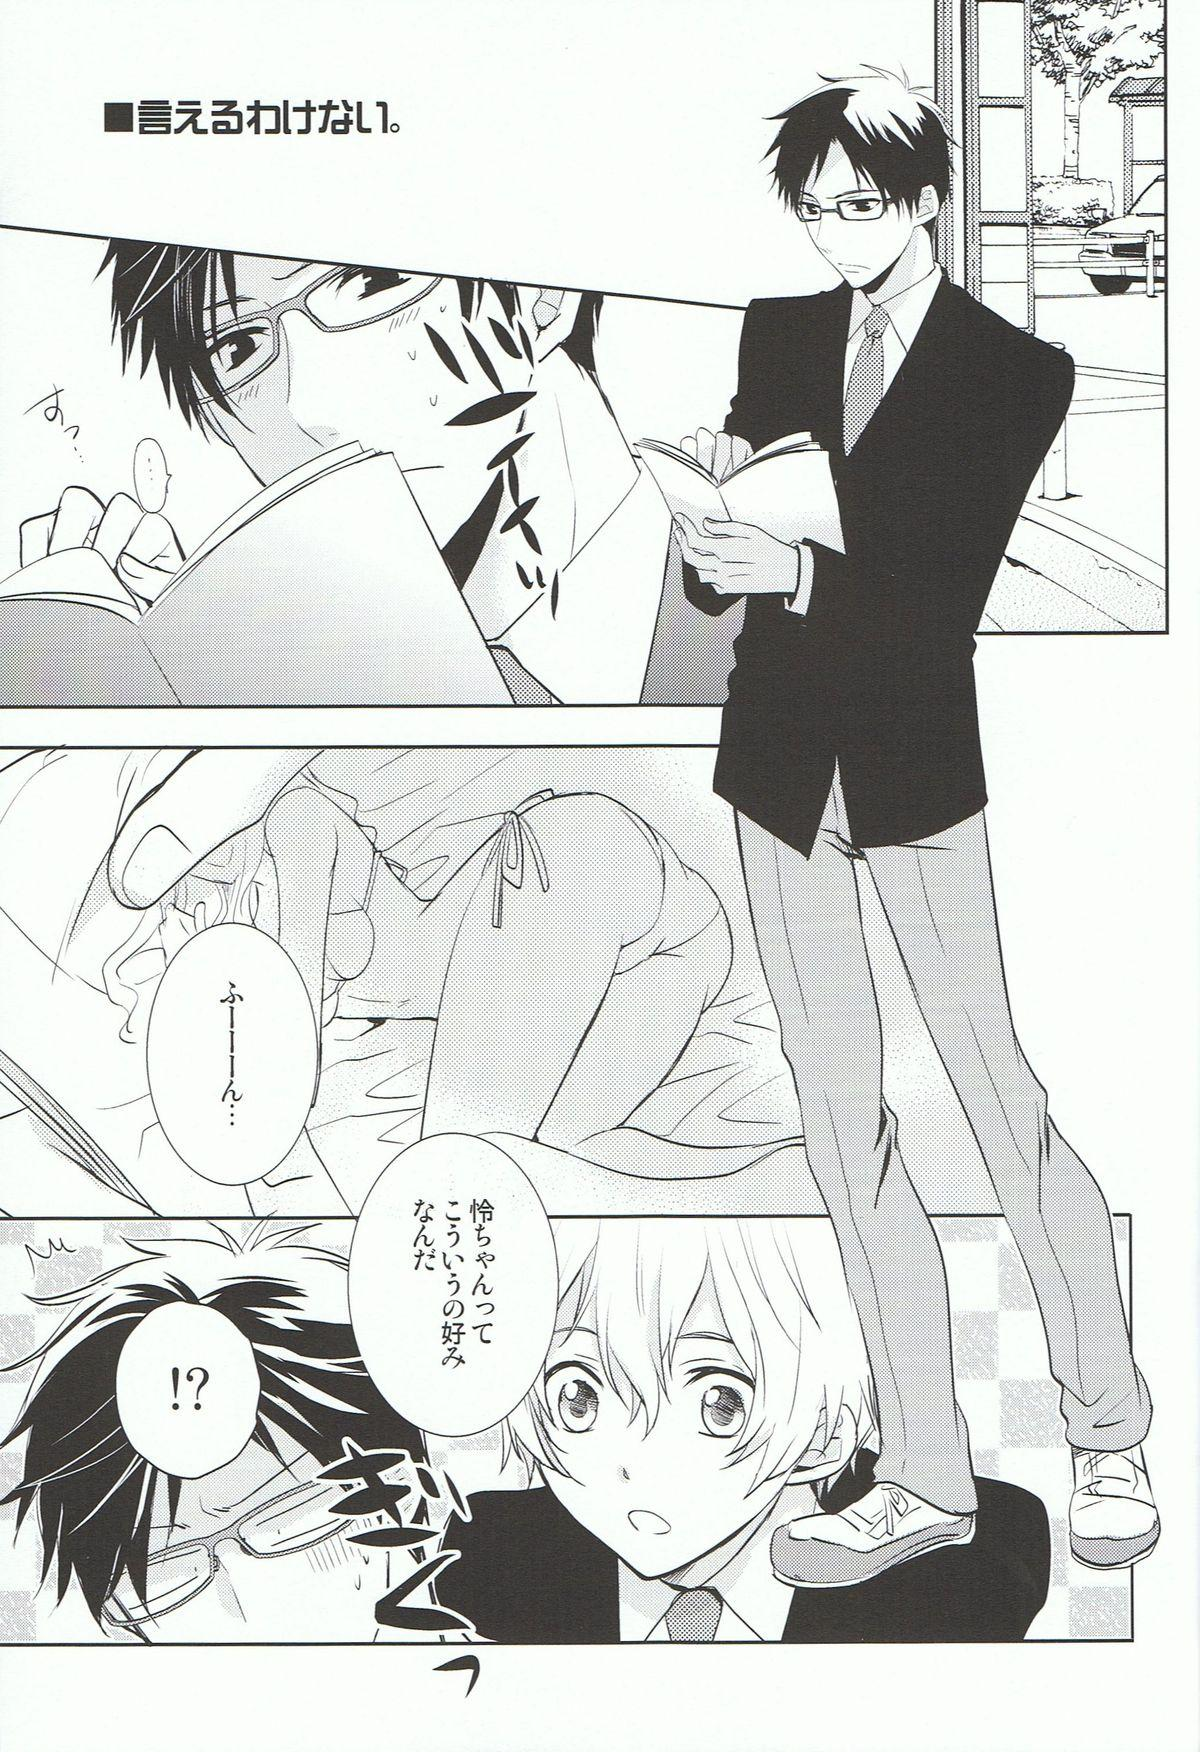 Nagisa-kun de ii deshou! 11